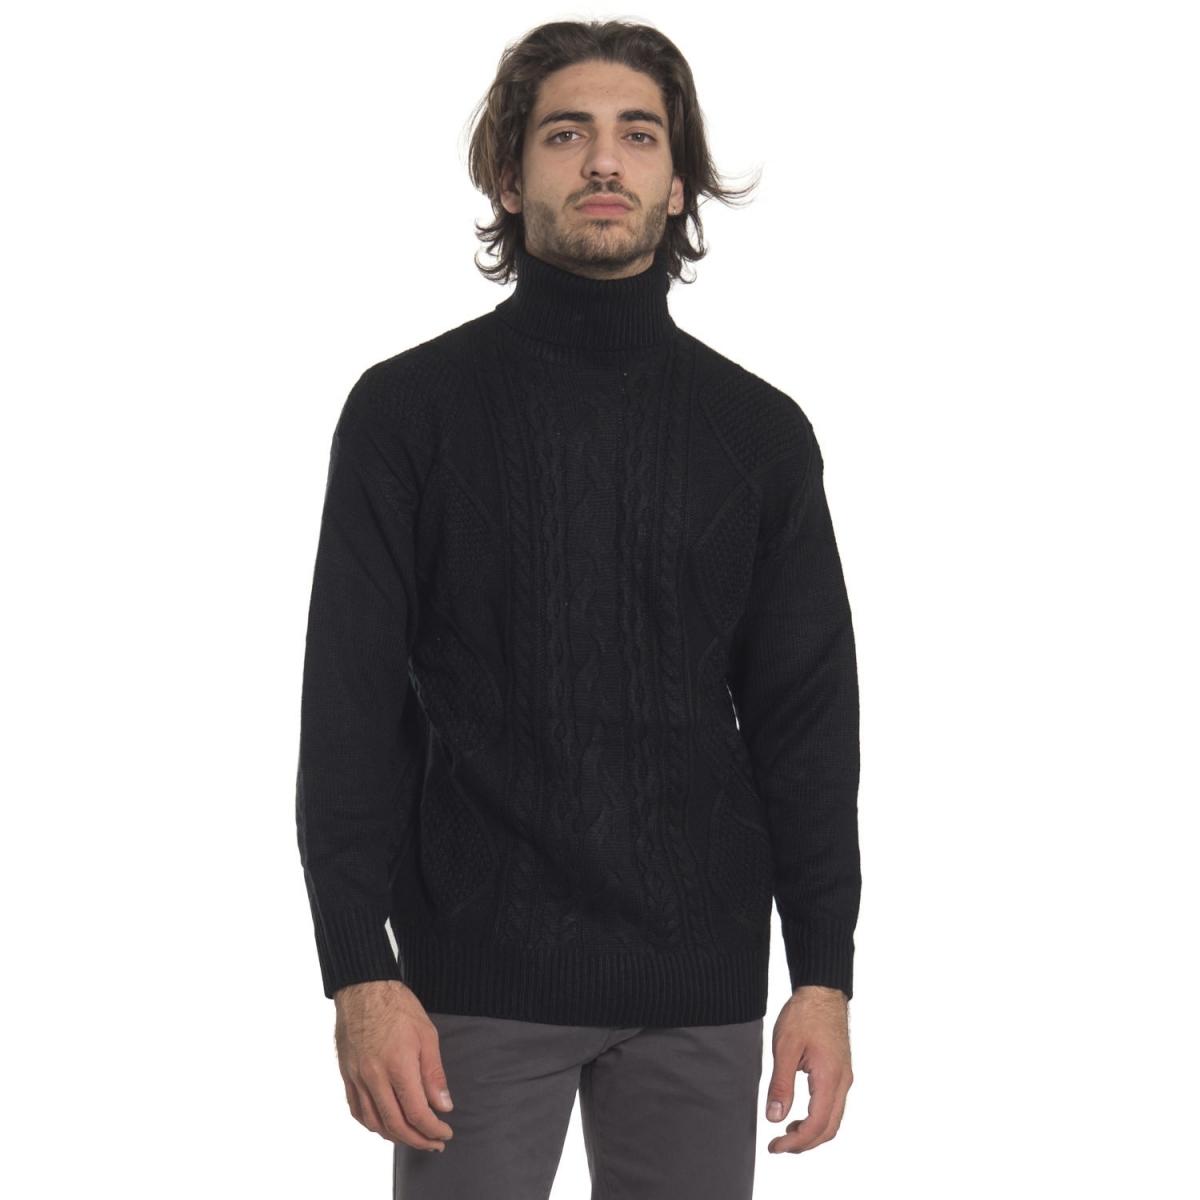 clothing Knitwears men Maglia LPATA305 LANDEK PARK Cafedelmar Shop